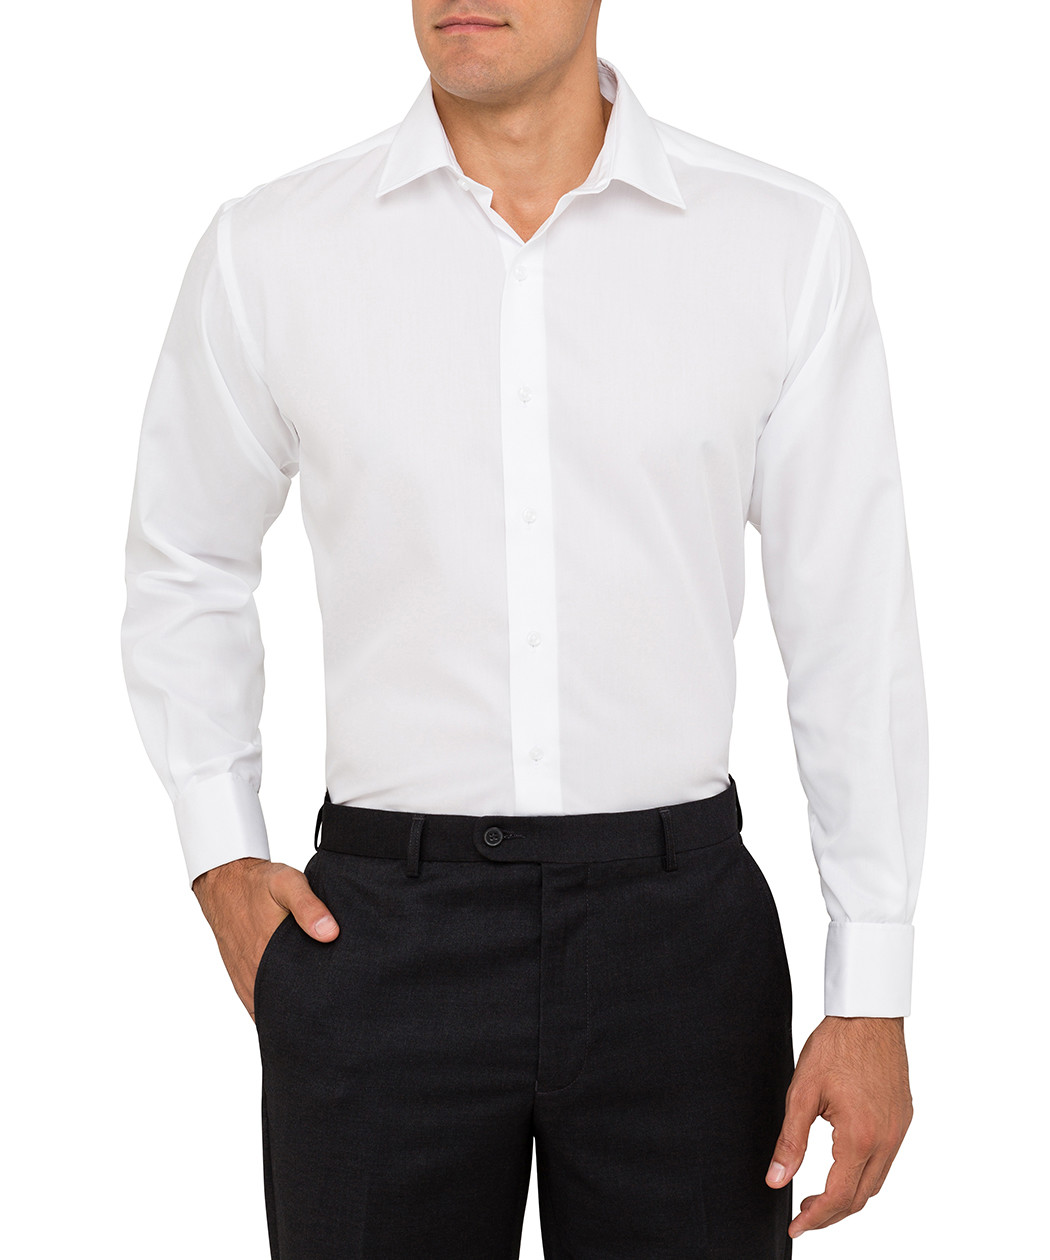 Van Heusen Euro Fit Cotton White Mens Shirt | Van Heusen Australia